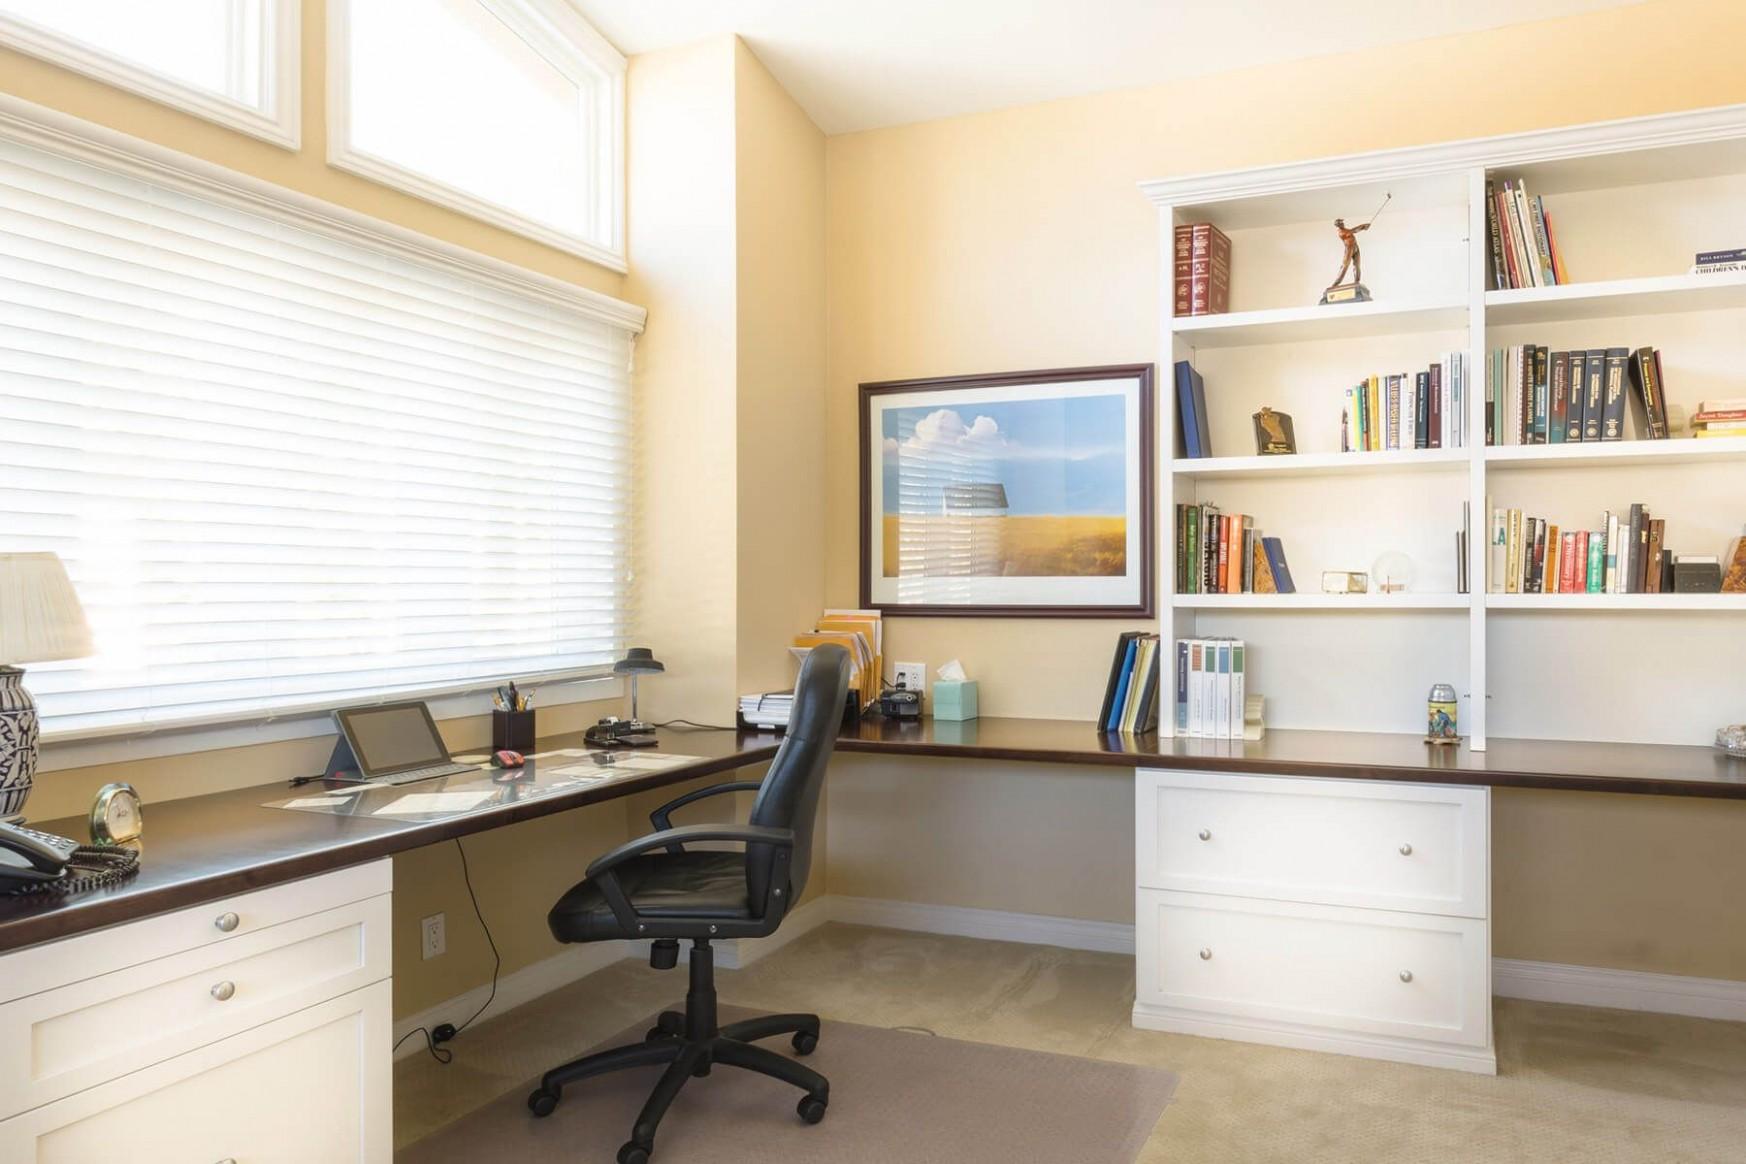 11 Really Great Home Office Ideas (Photos)  Cheap office  - Home Office Ideas With L Shaped Desk